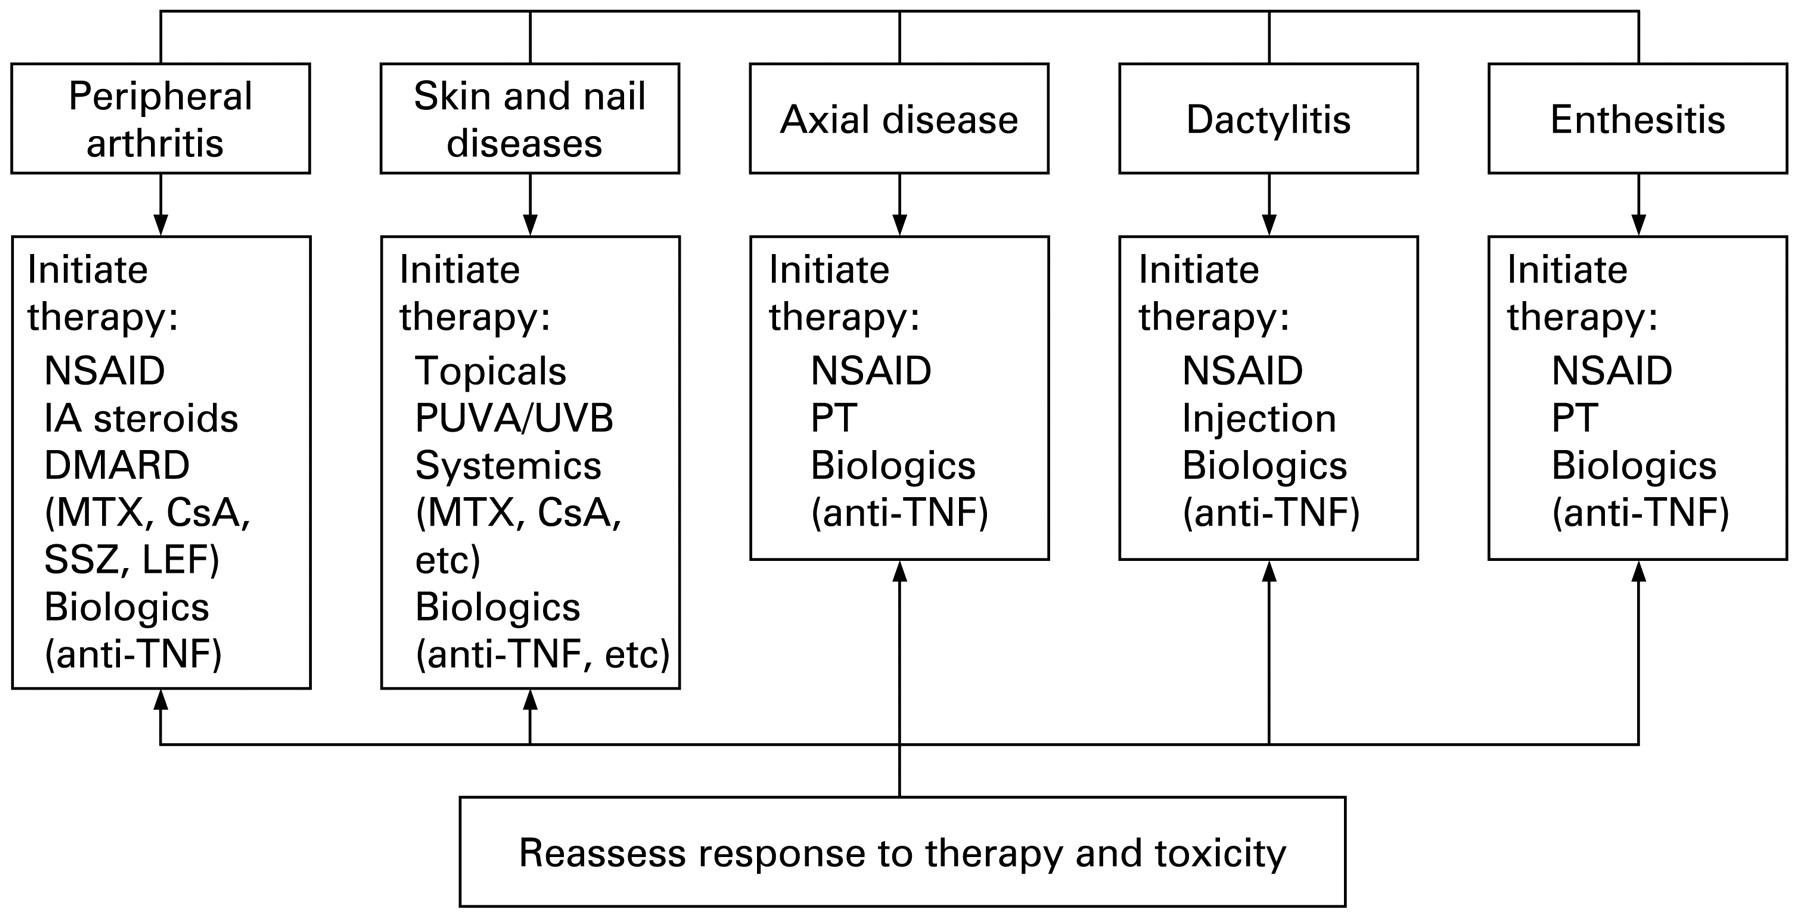 Treatment Recommendations For Psoriatic Arthritis Annals